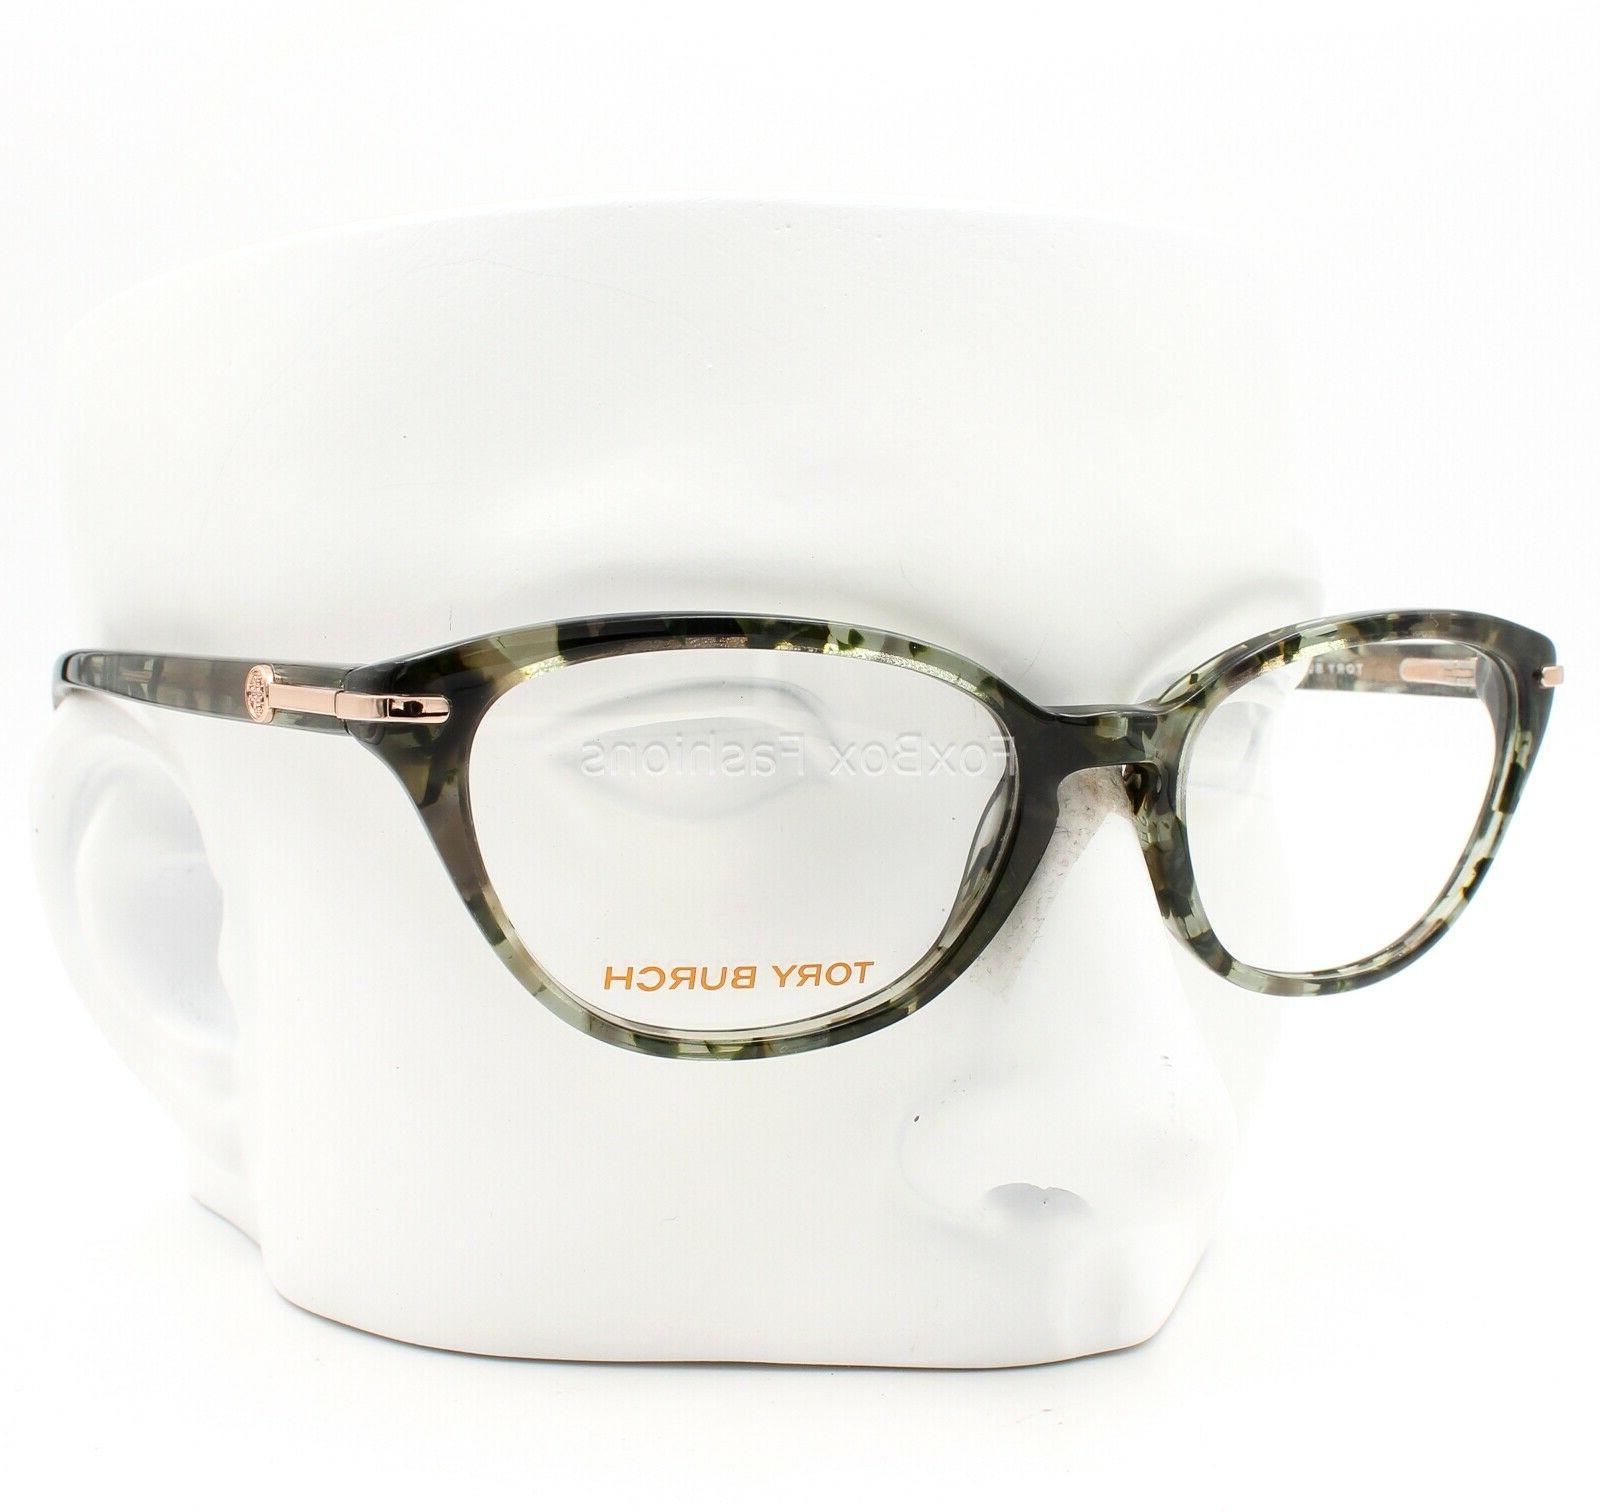 TORY BURCH TY 2034 1241 Eyeglasses Optical Frames Glasses ~